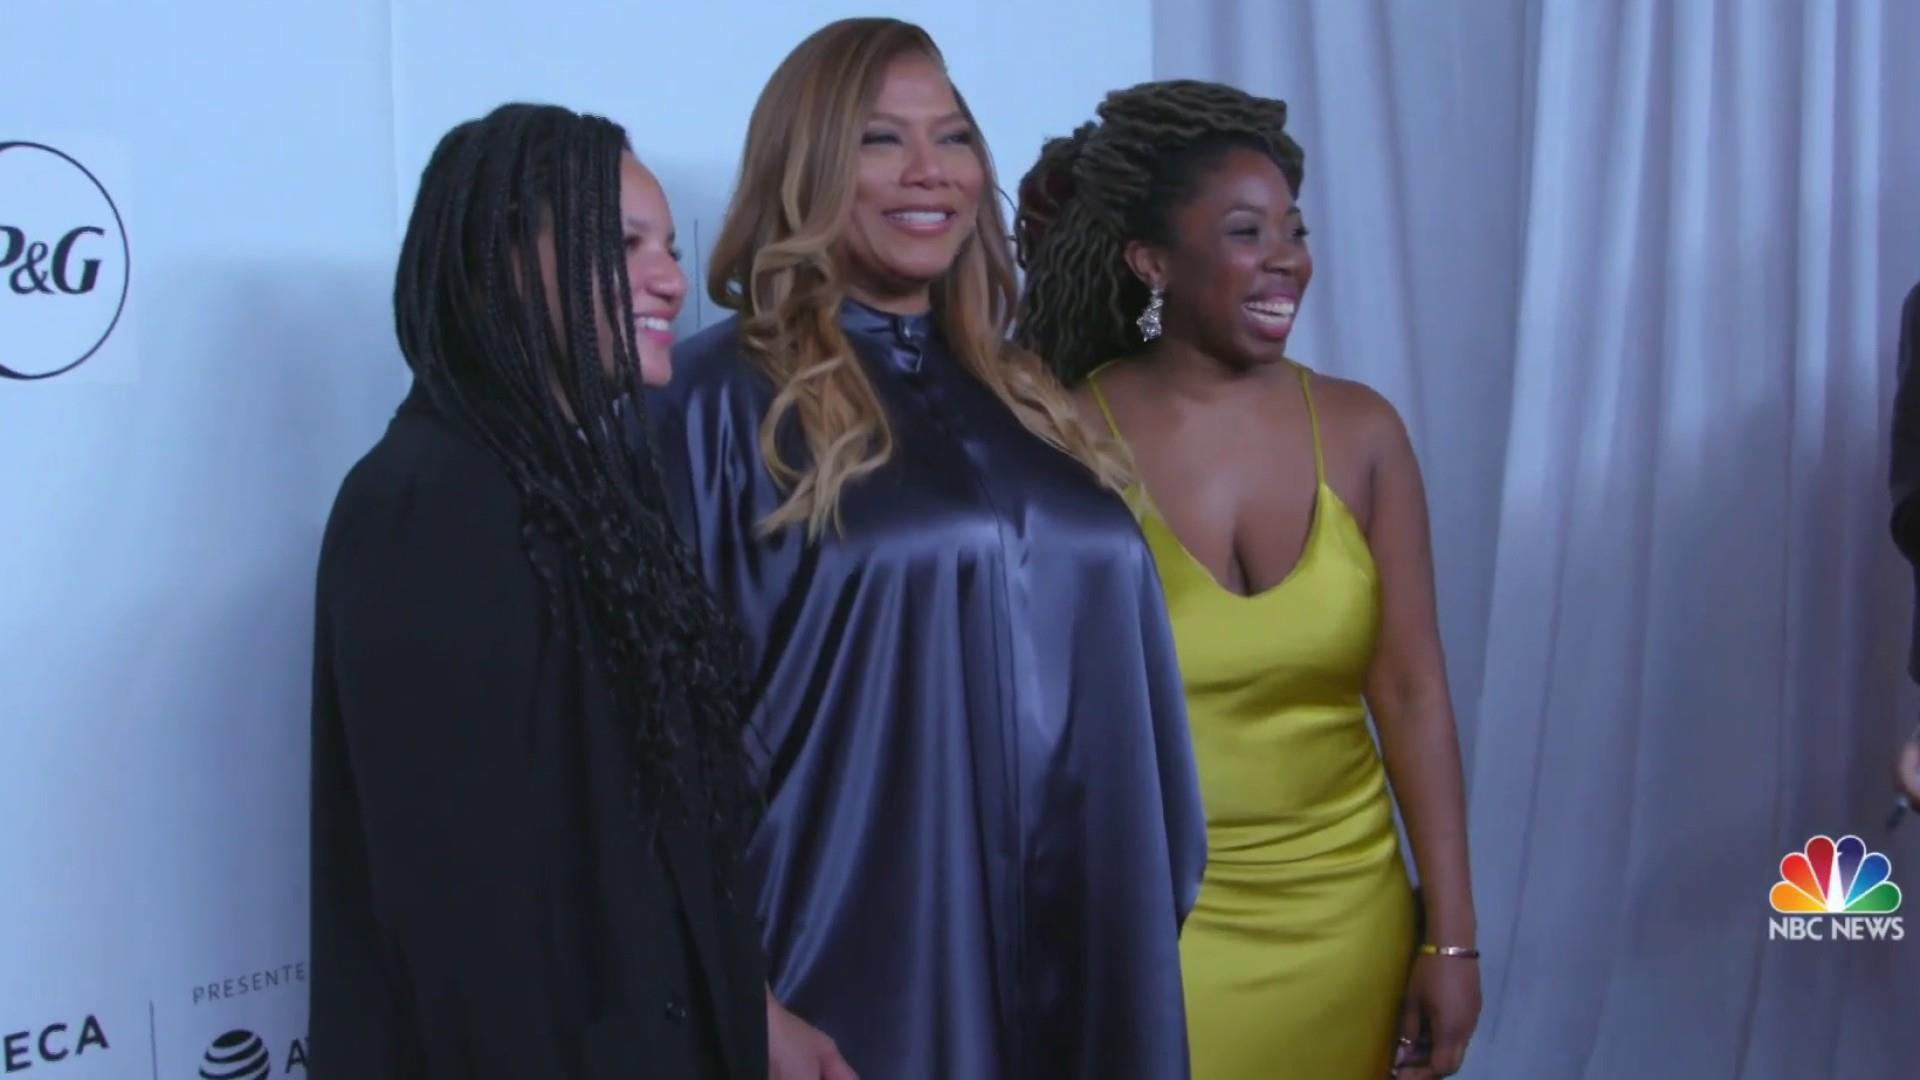 Queen Latifah starts mentorship program to support aspiring female filmmakers